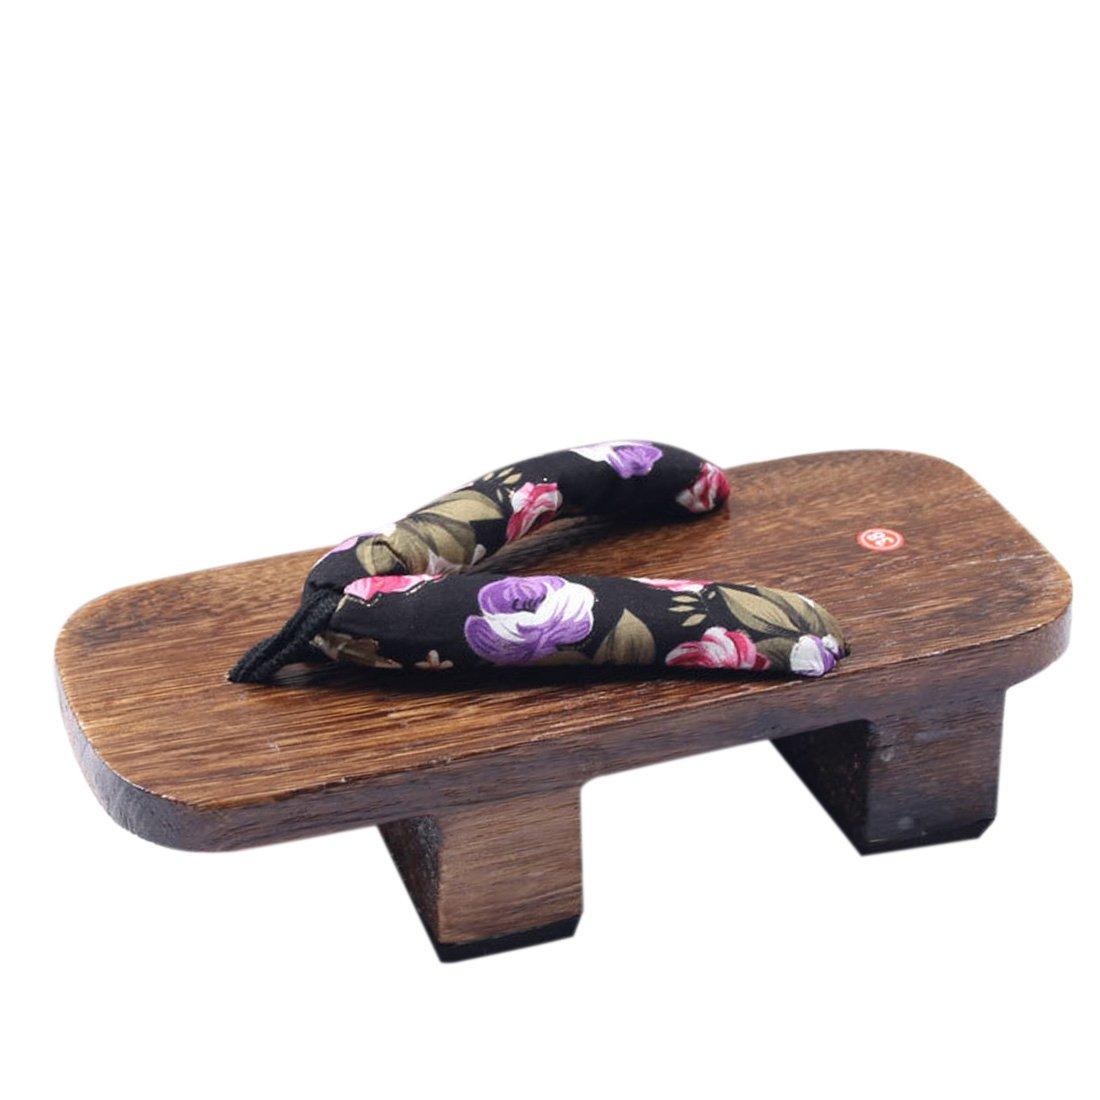 Jiyaru Women's Japanese Style Wood Geta Sandal High Heel Clog Flip Flop #3 US7 by Jiyaru